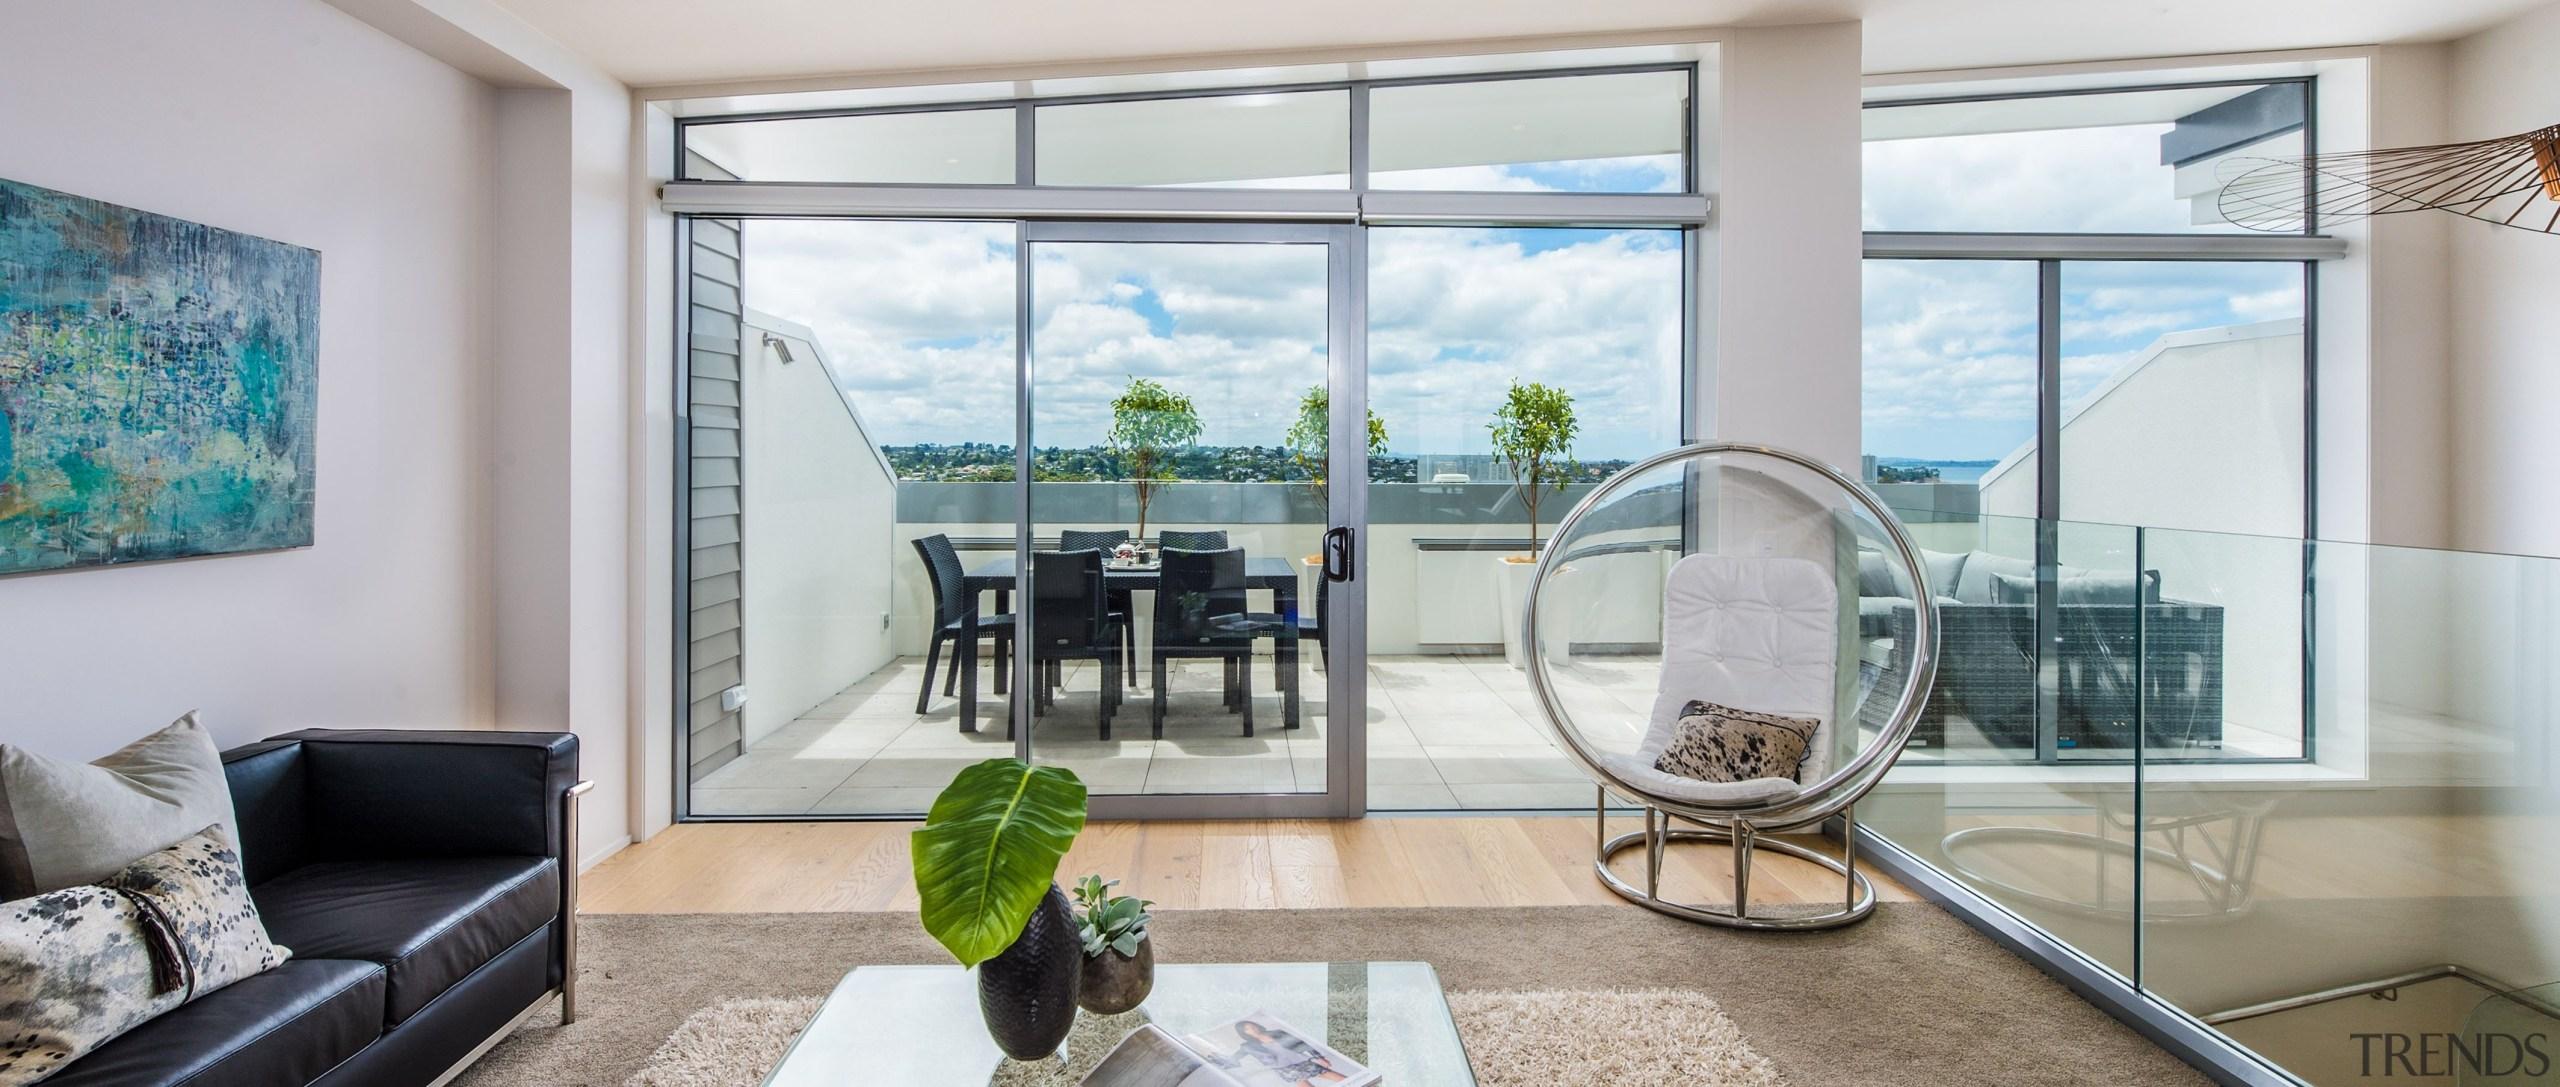 Seaview - apartment | balcony | door | apartment, balcony, door, home, house, interior design, living room, property, real estate, window, gray